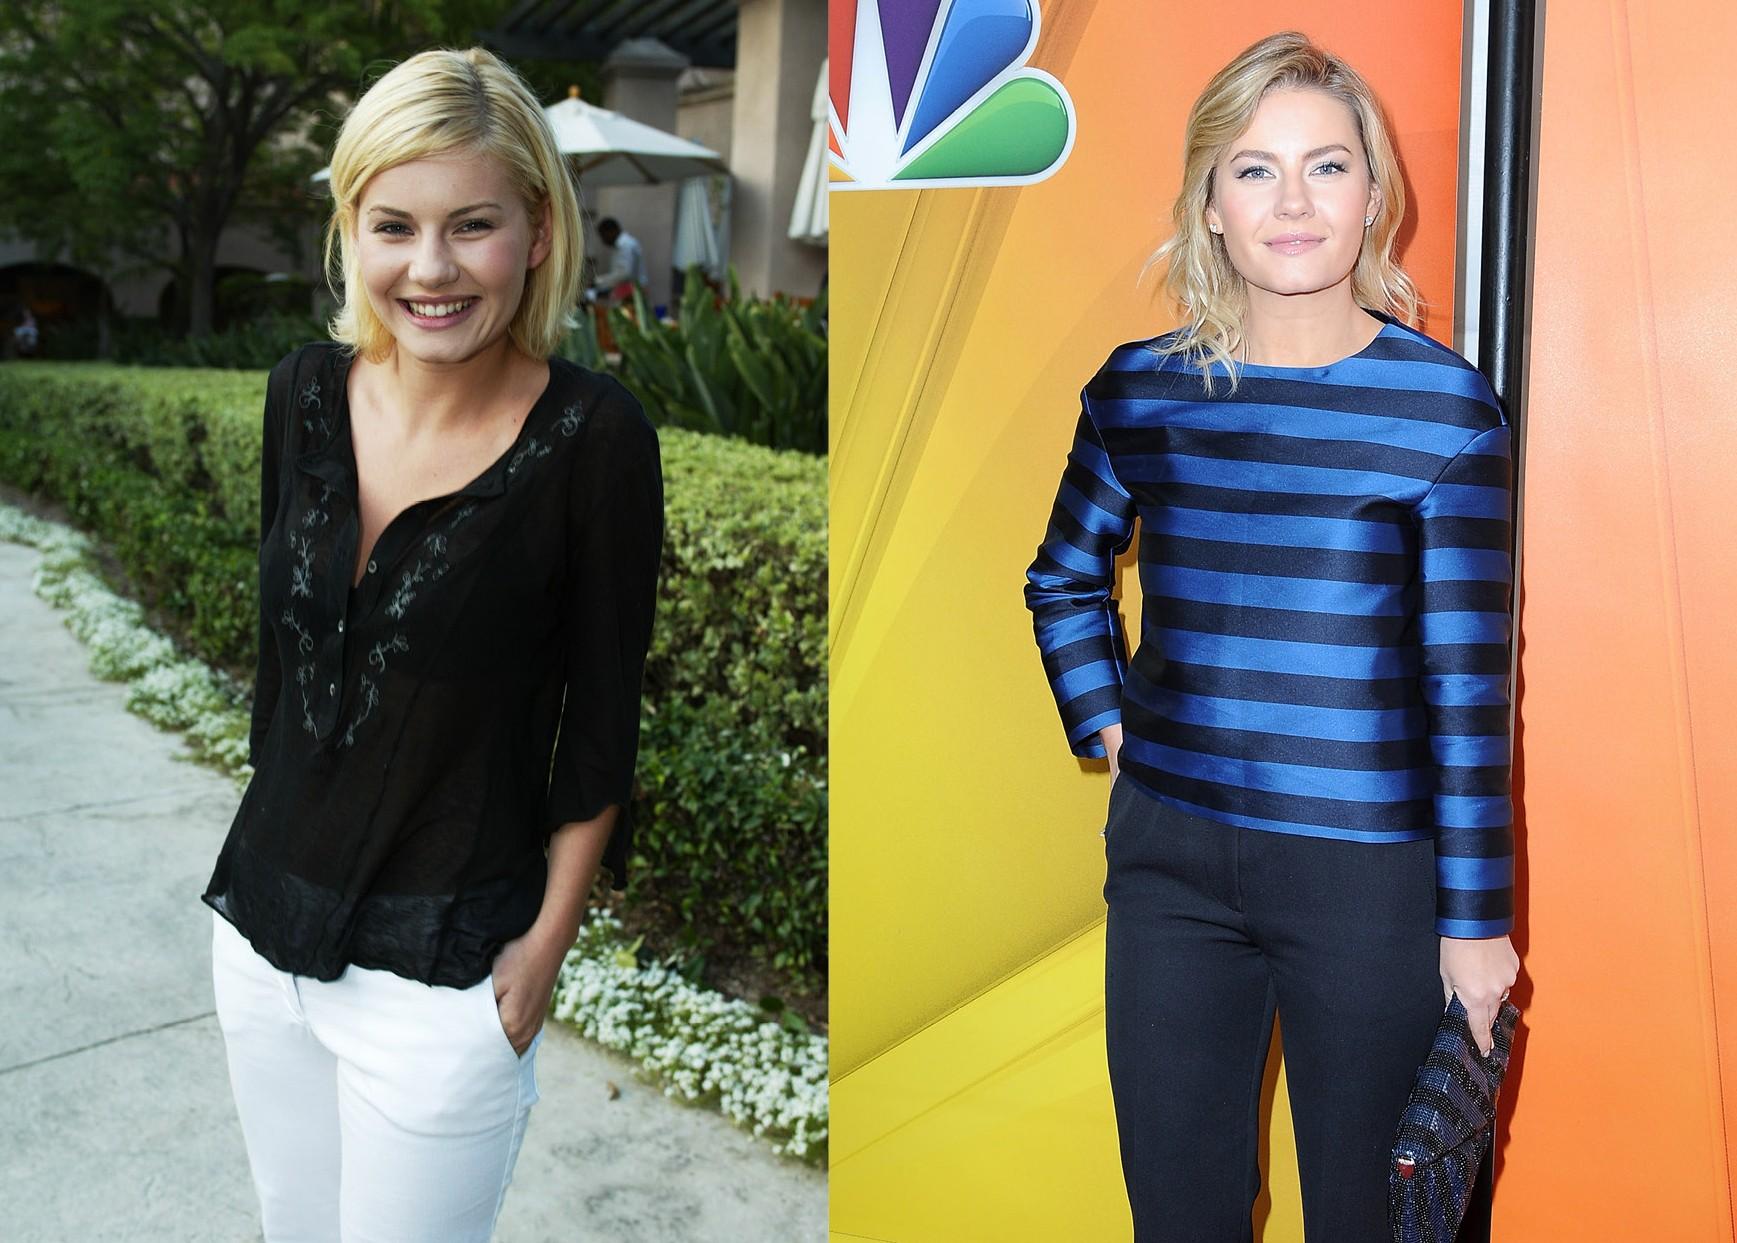 Elisha Cuthbert em 2002 e em 2015 (Foto: Getty Images)